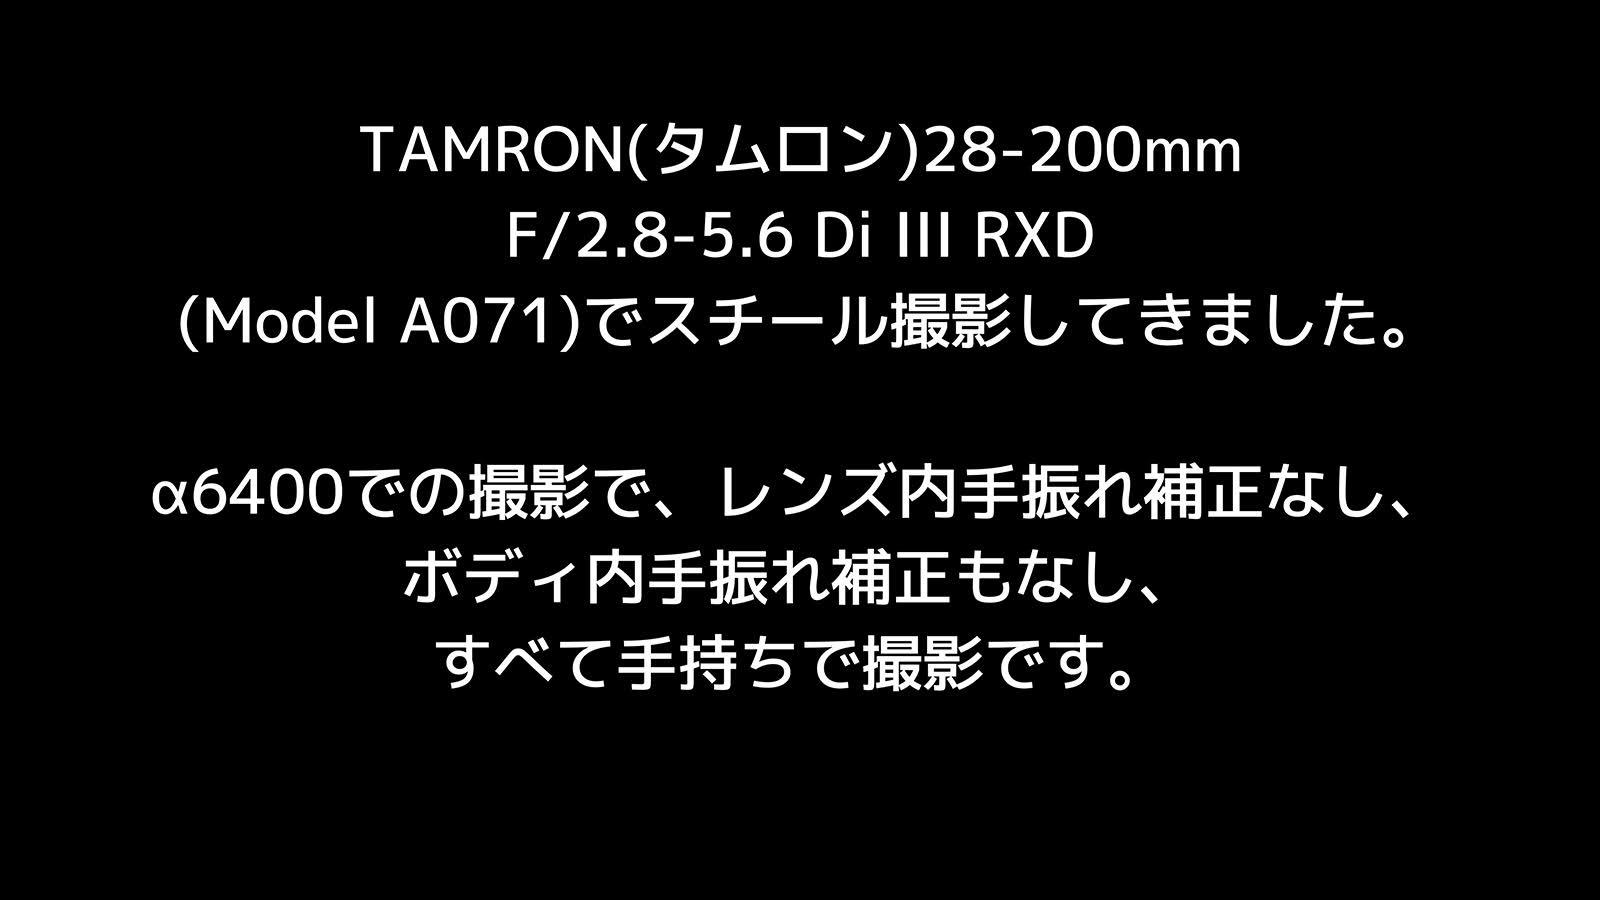 TAMRON(タムロン)28-200mmF/2.8-5.6 Di III RXD (Model A071)でスチール撮影してきました